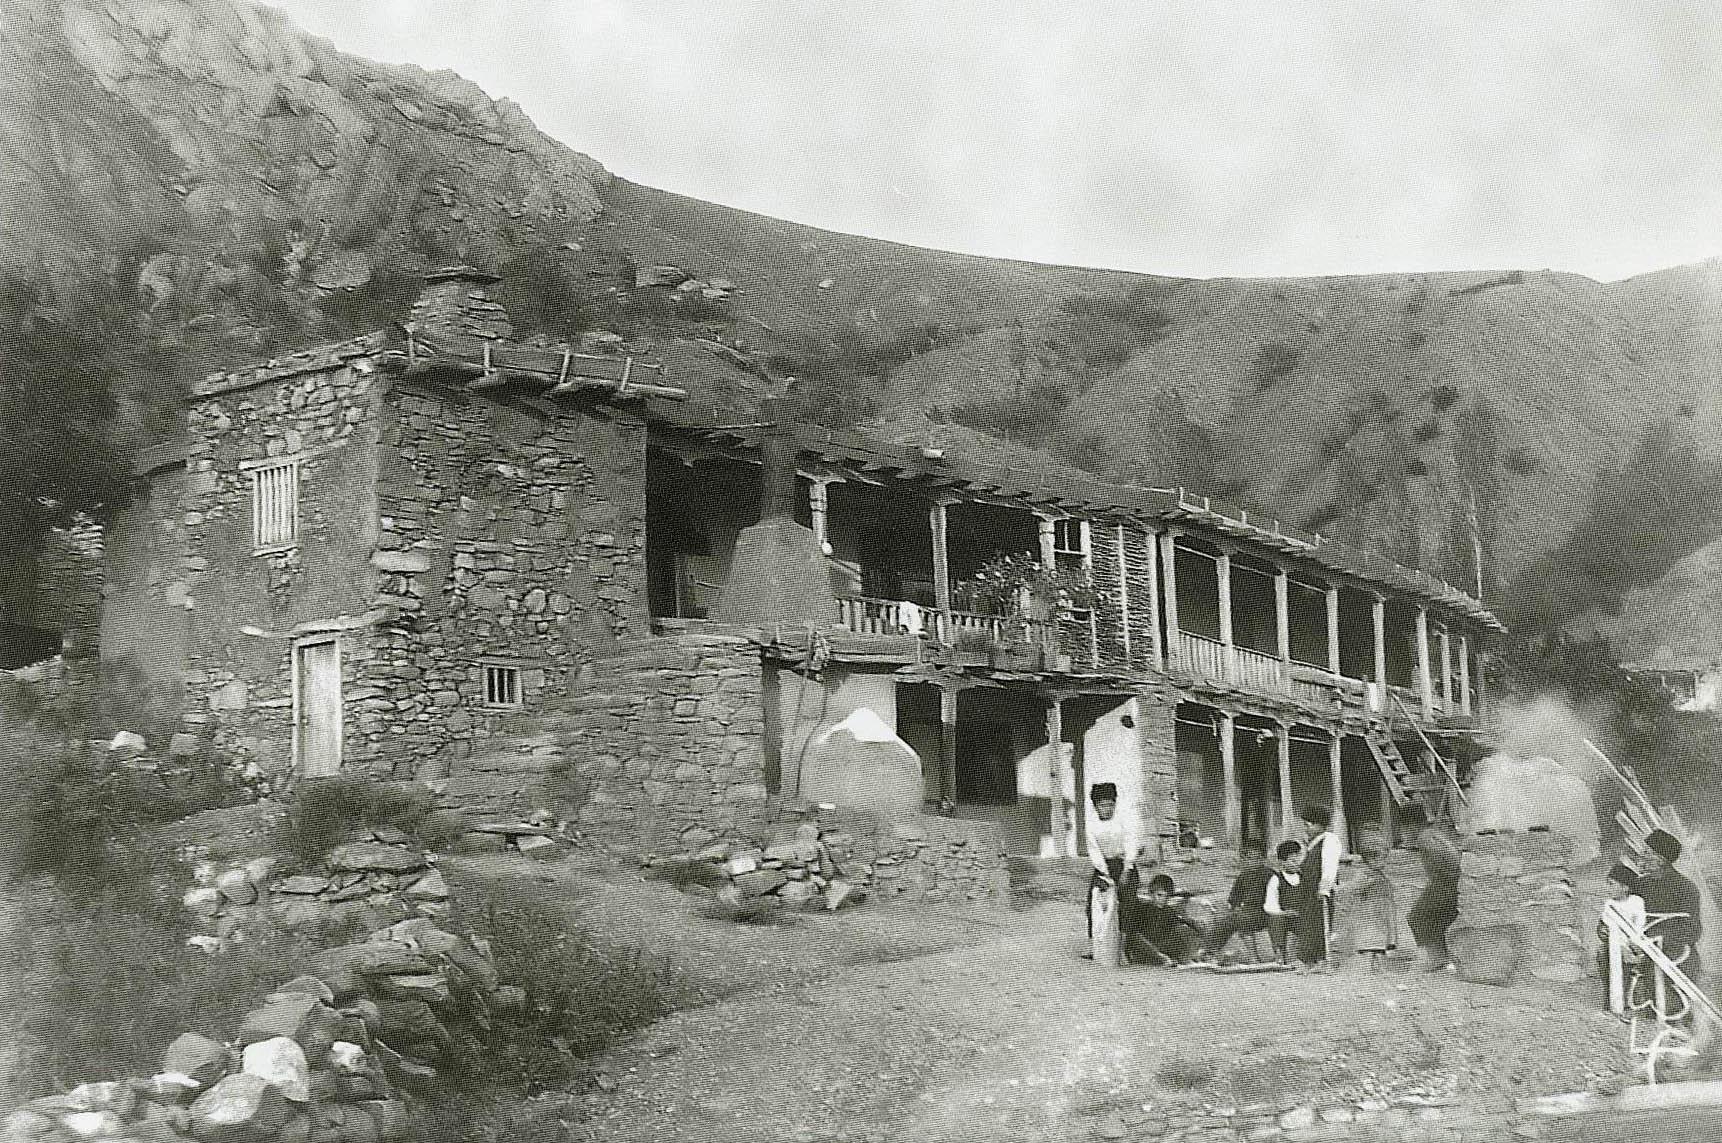 Casa rural tártara nos anos 1920 na vila de Shúmy, atual Verhnjaja Kutuzovka, na Ucrânia. Foto de Useyn Bodaninsky.